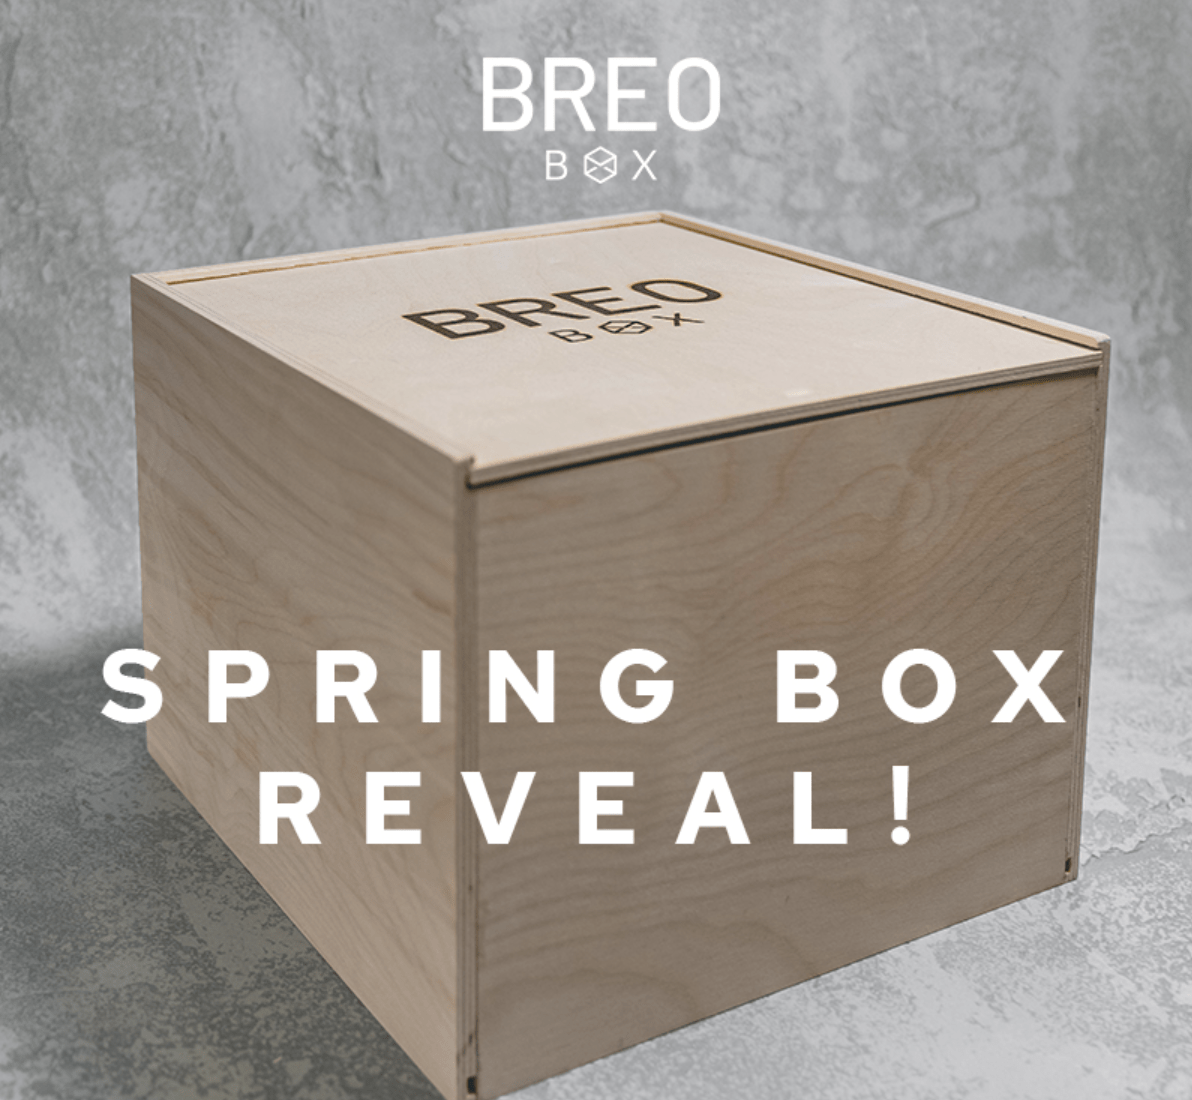 Breo Box Spring 2021 FULL Spoilers